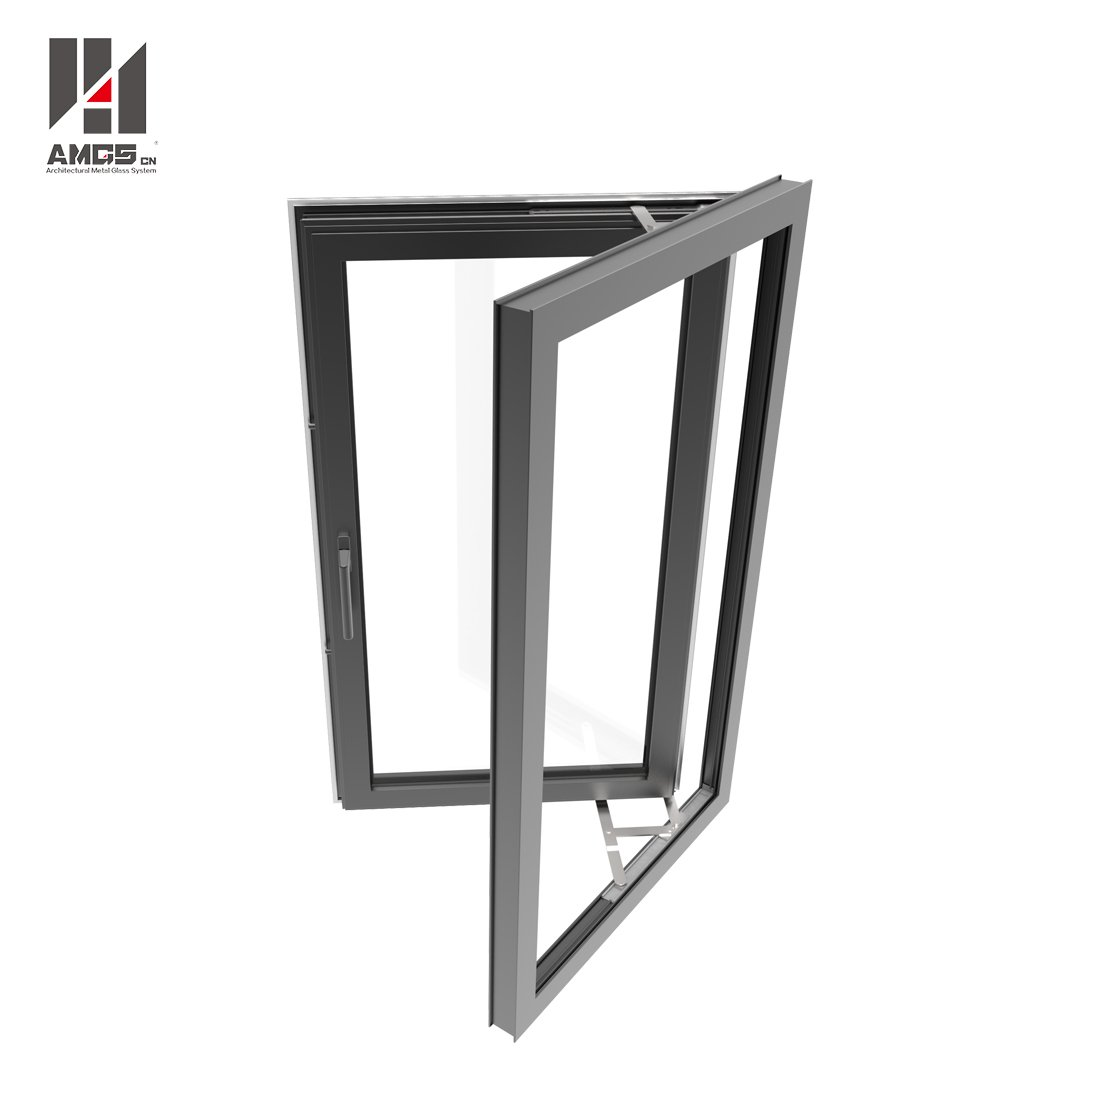 AMGS Aluminium Casement Windows With Tempered Glass Aluminum Casement Windows image8